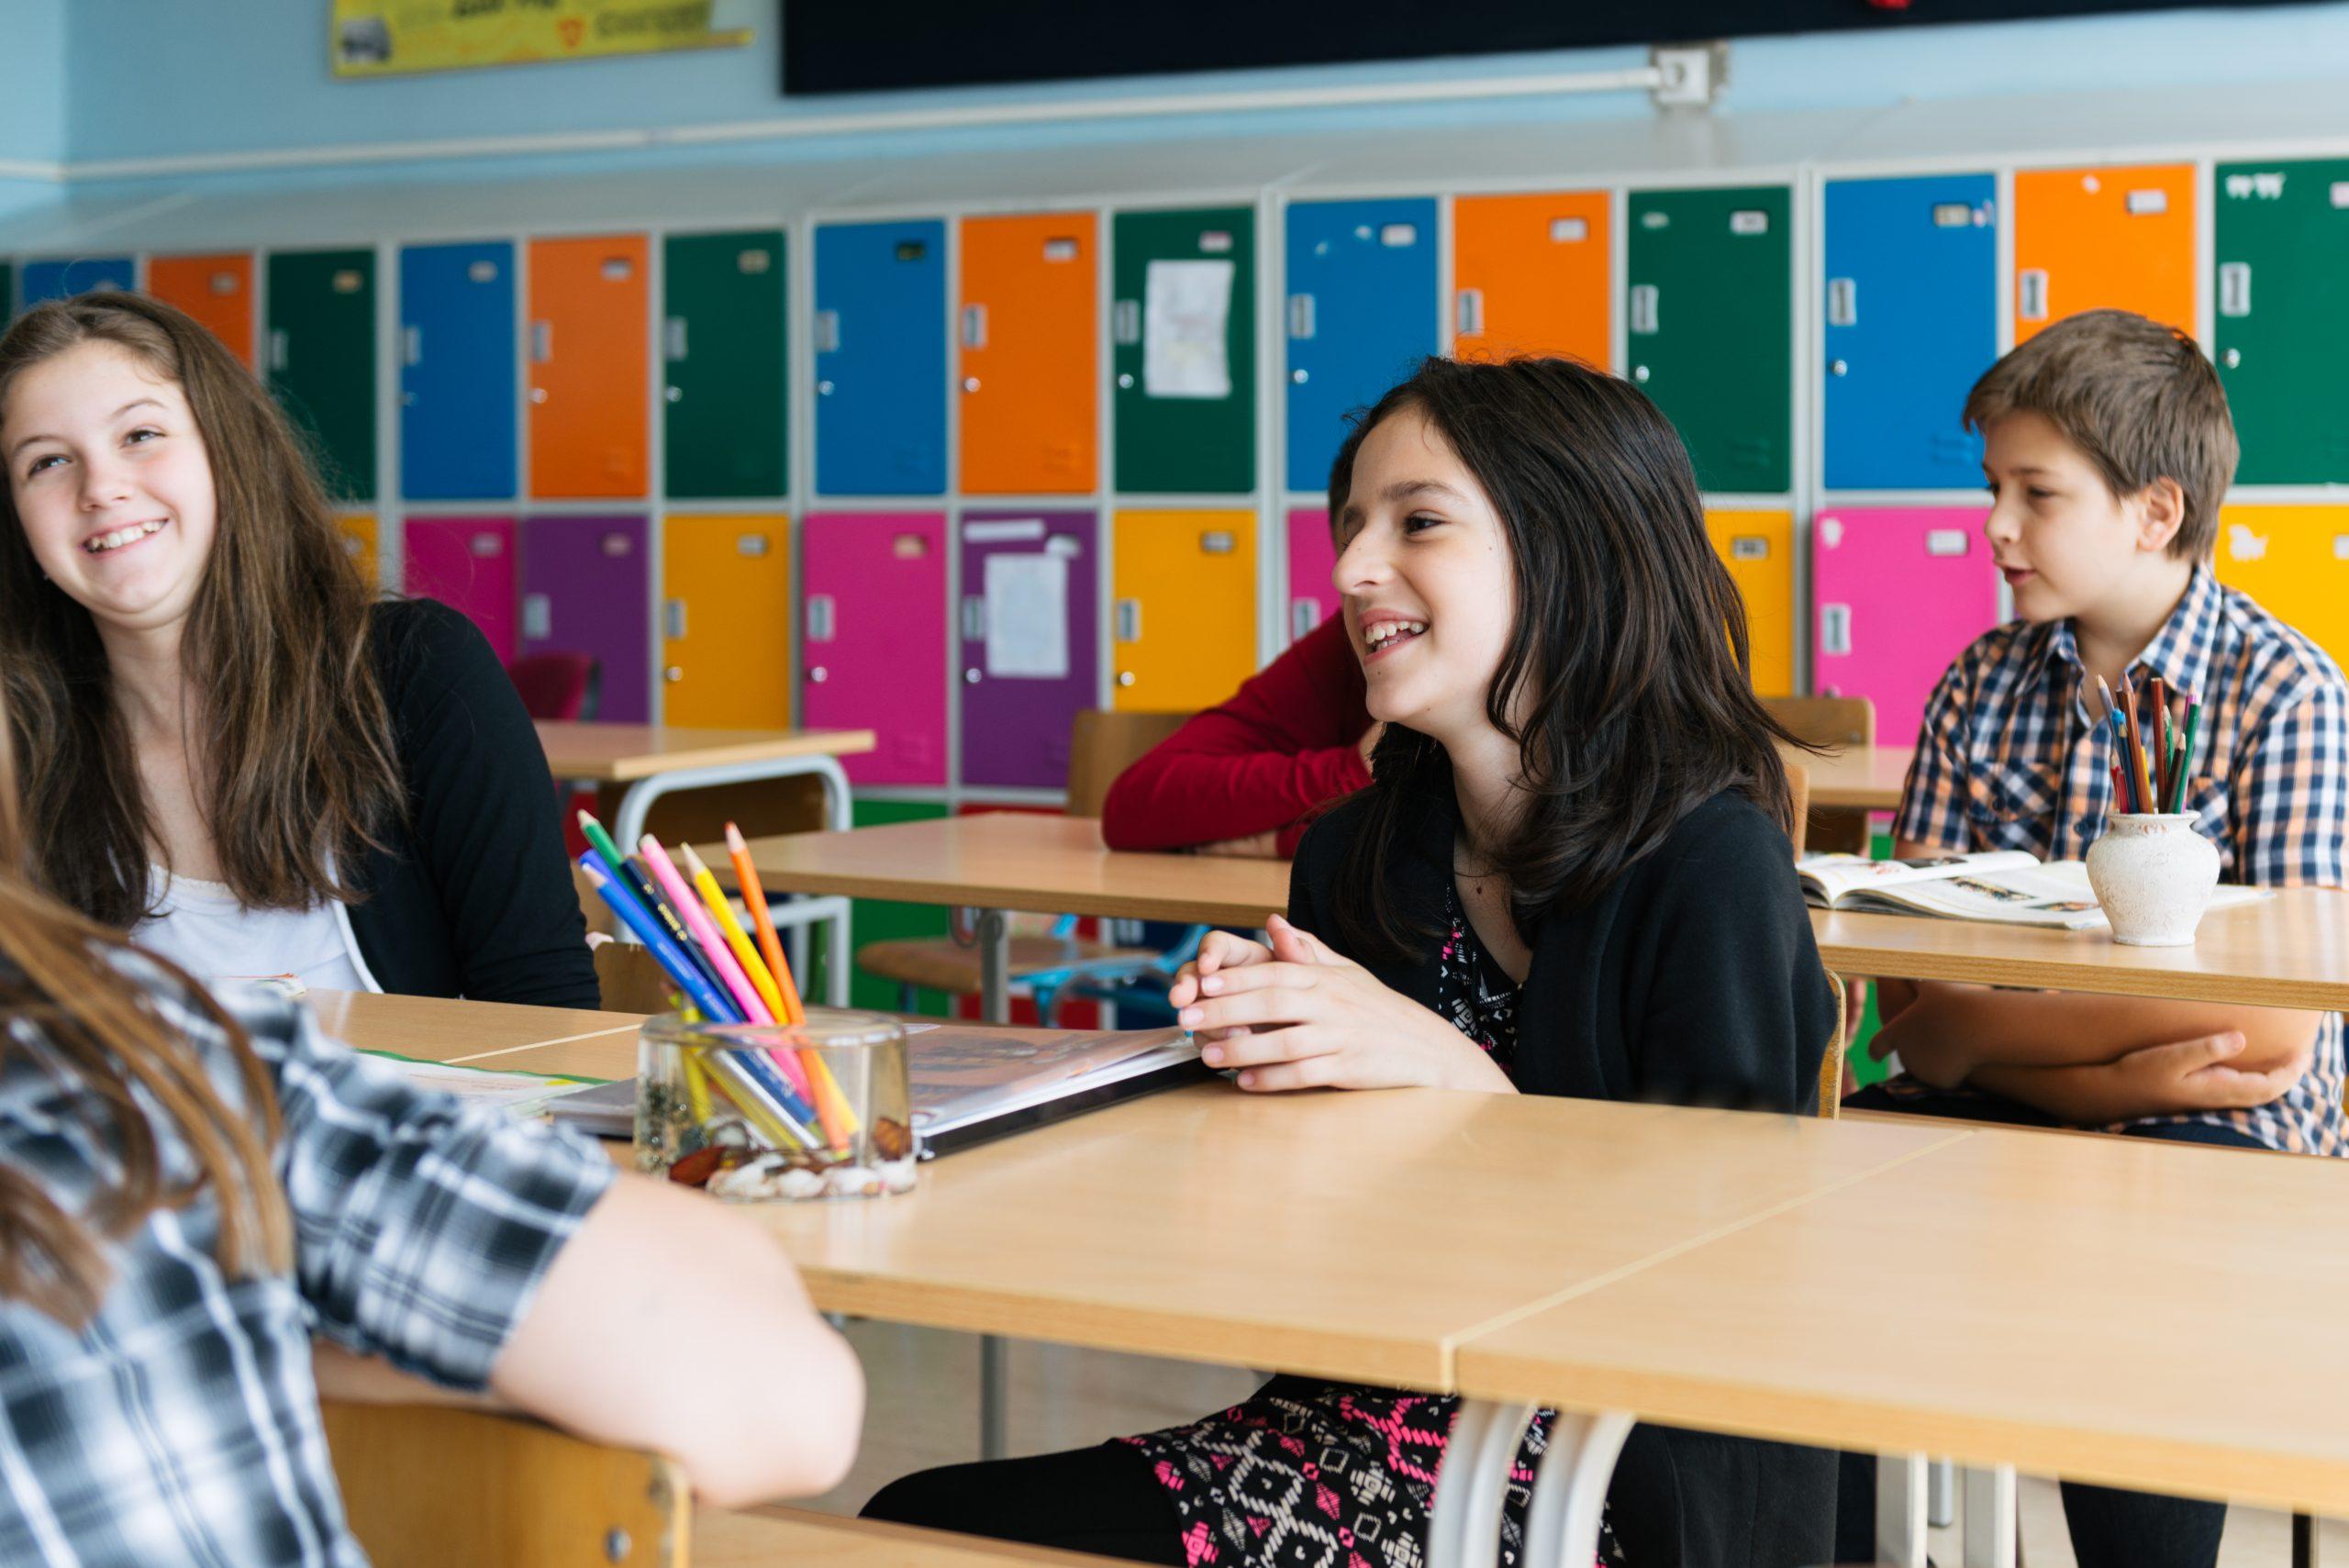 Europa reabre escuelas pese a repunte de casos de COVID-19